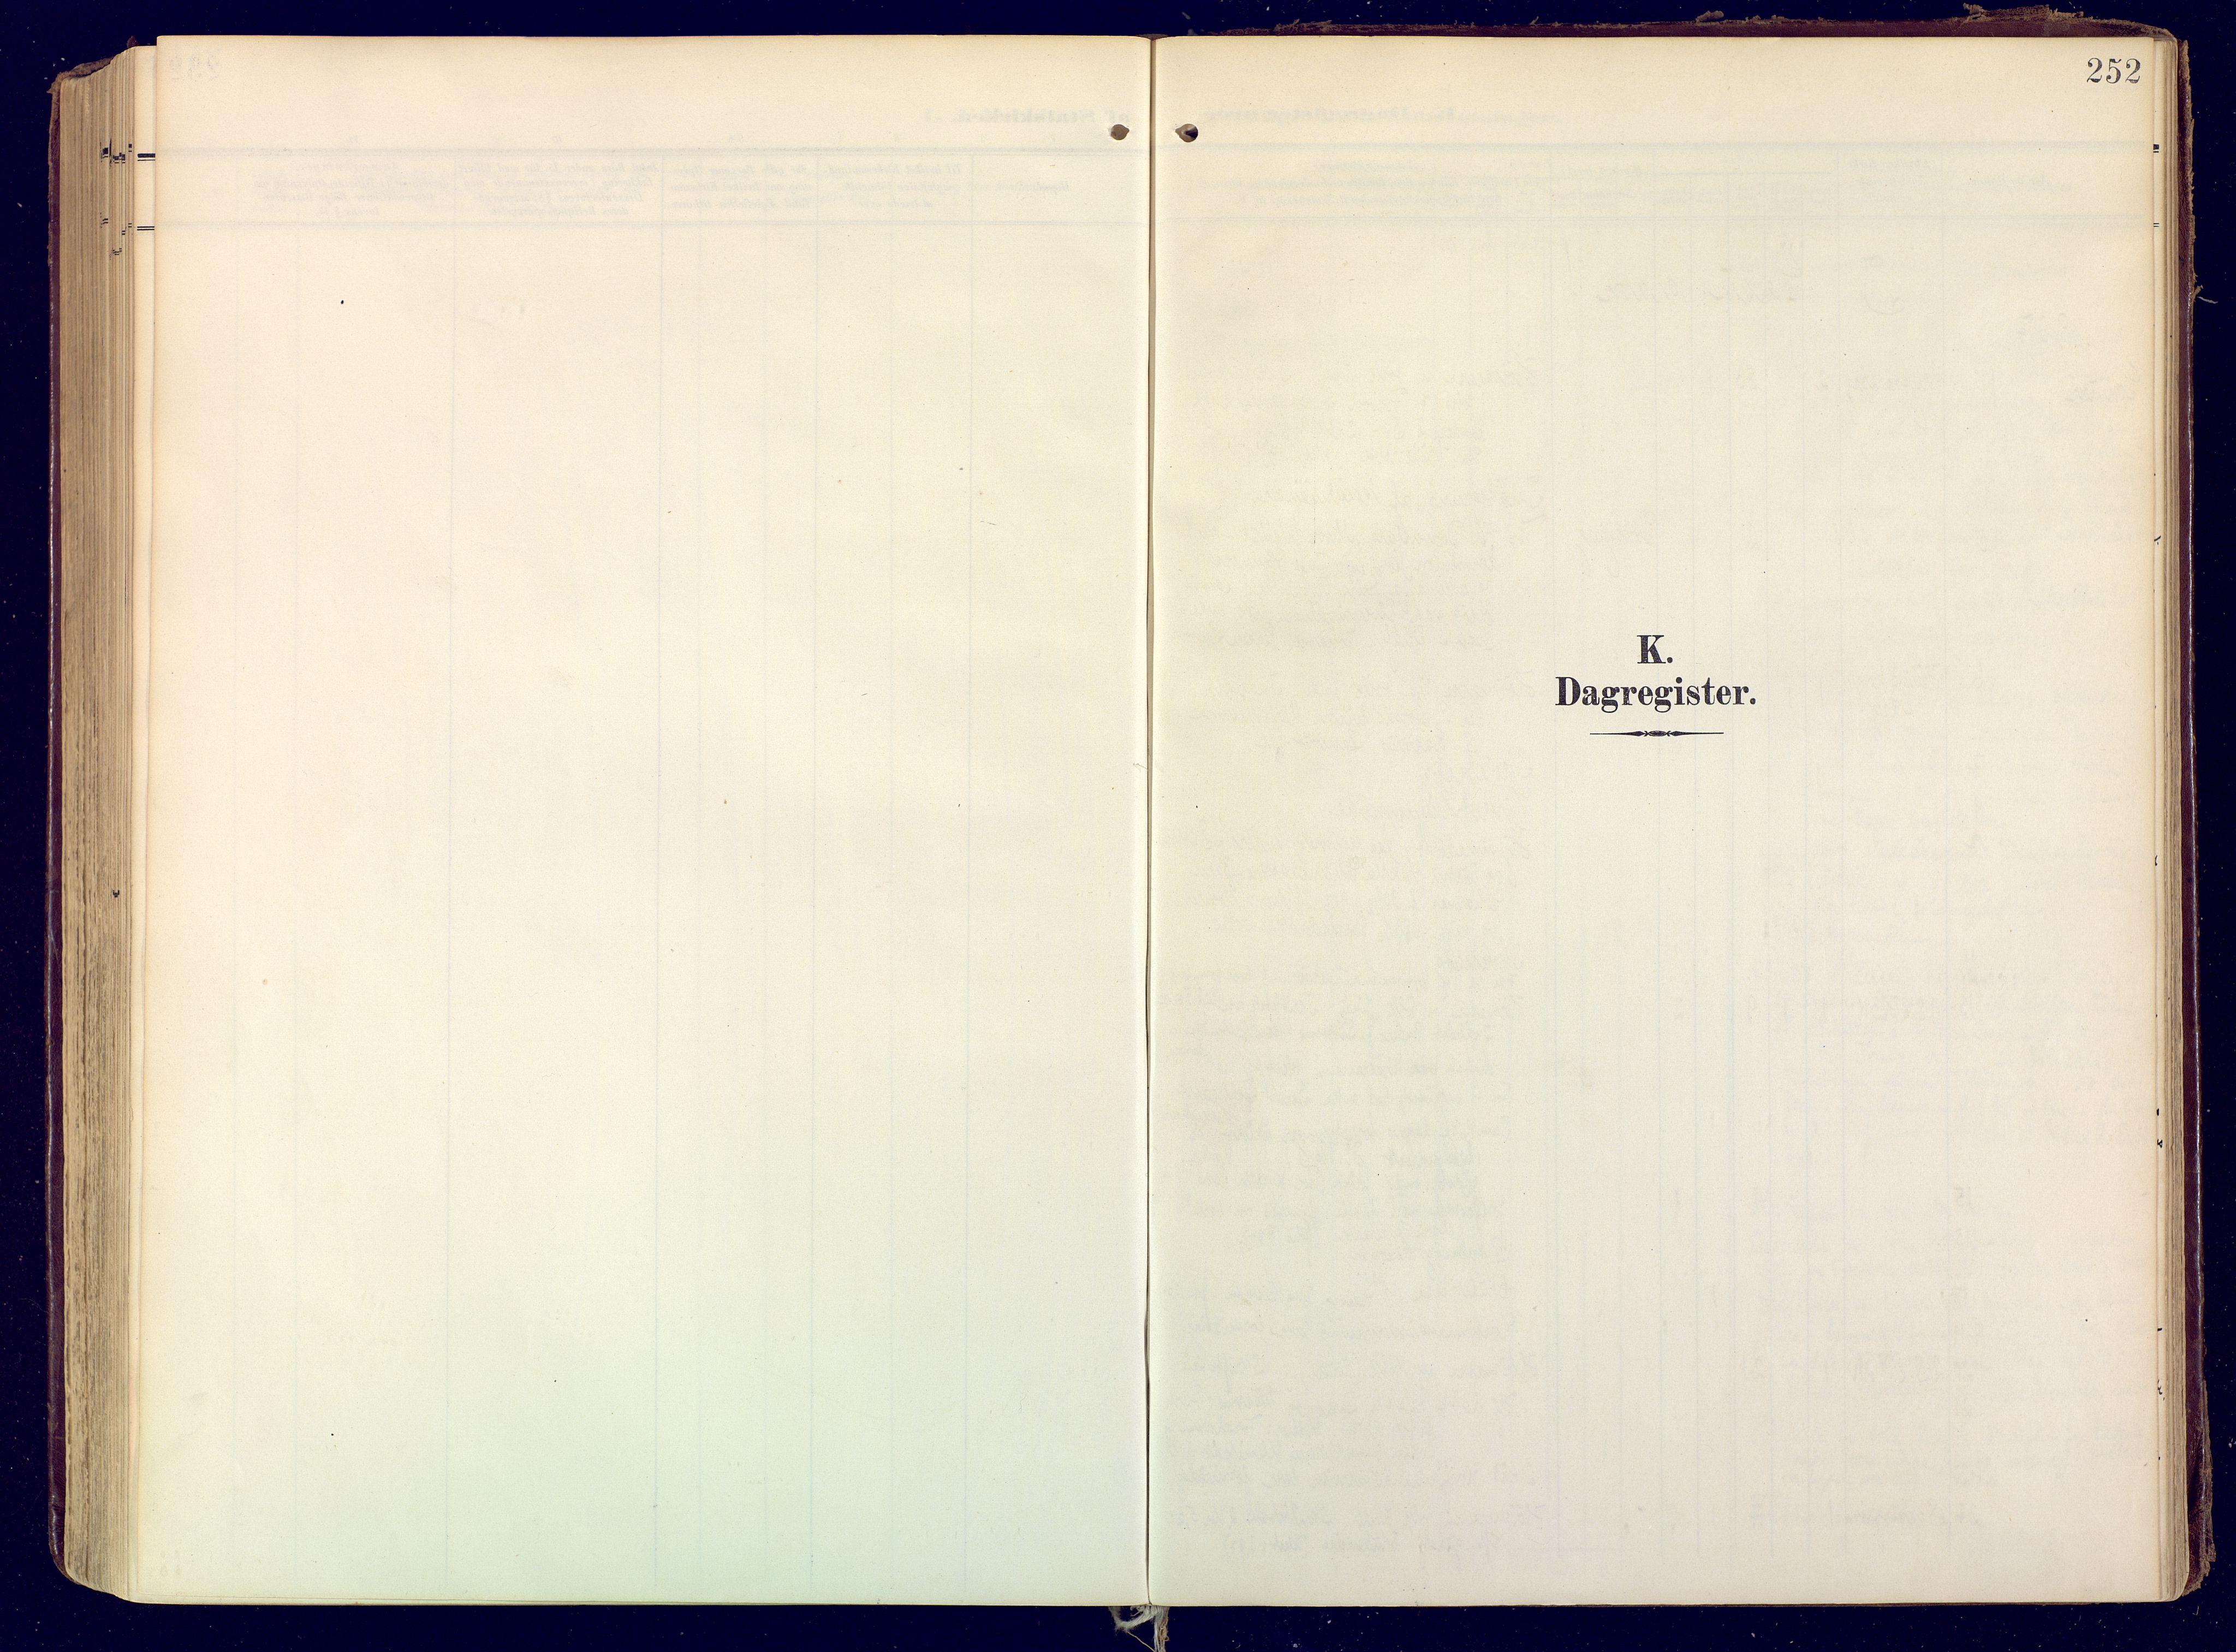 SATØ, Karasjok sokneprestkontor, H/Ha: Ministerialbok nr. 3, 1907-1926, s. 252